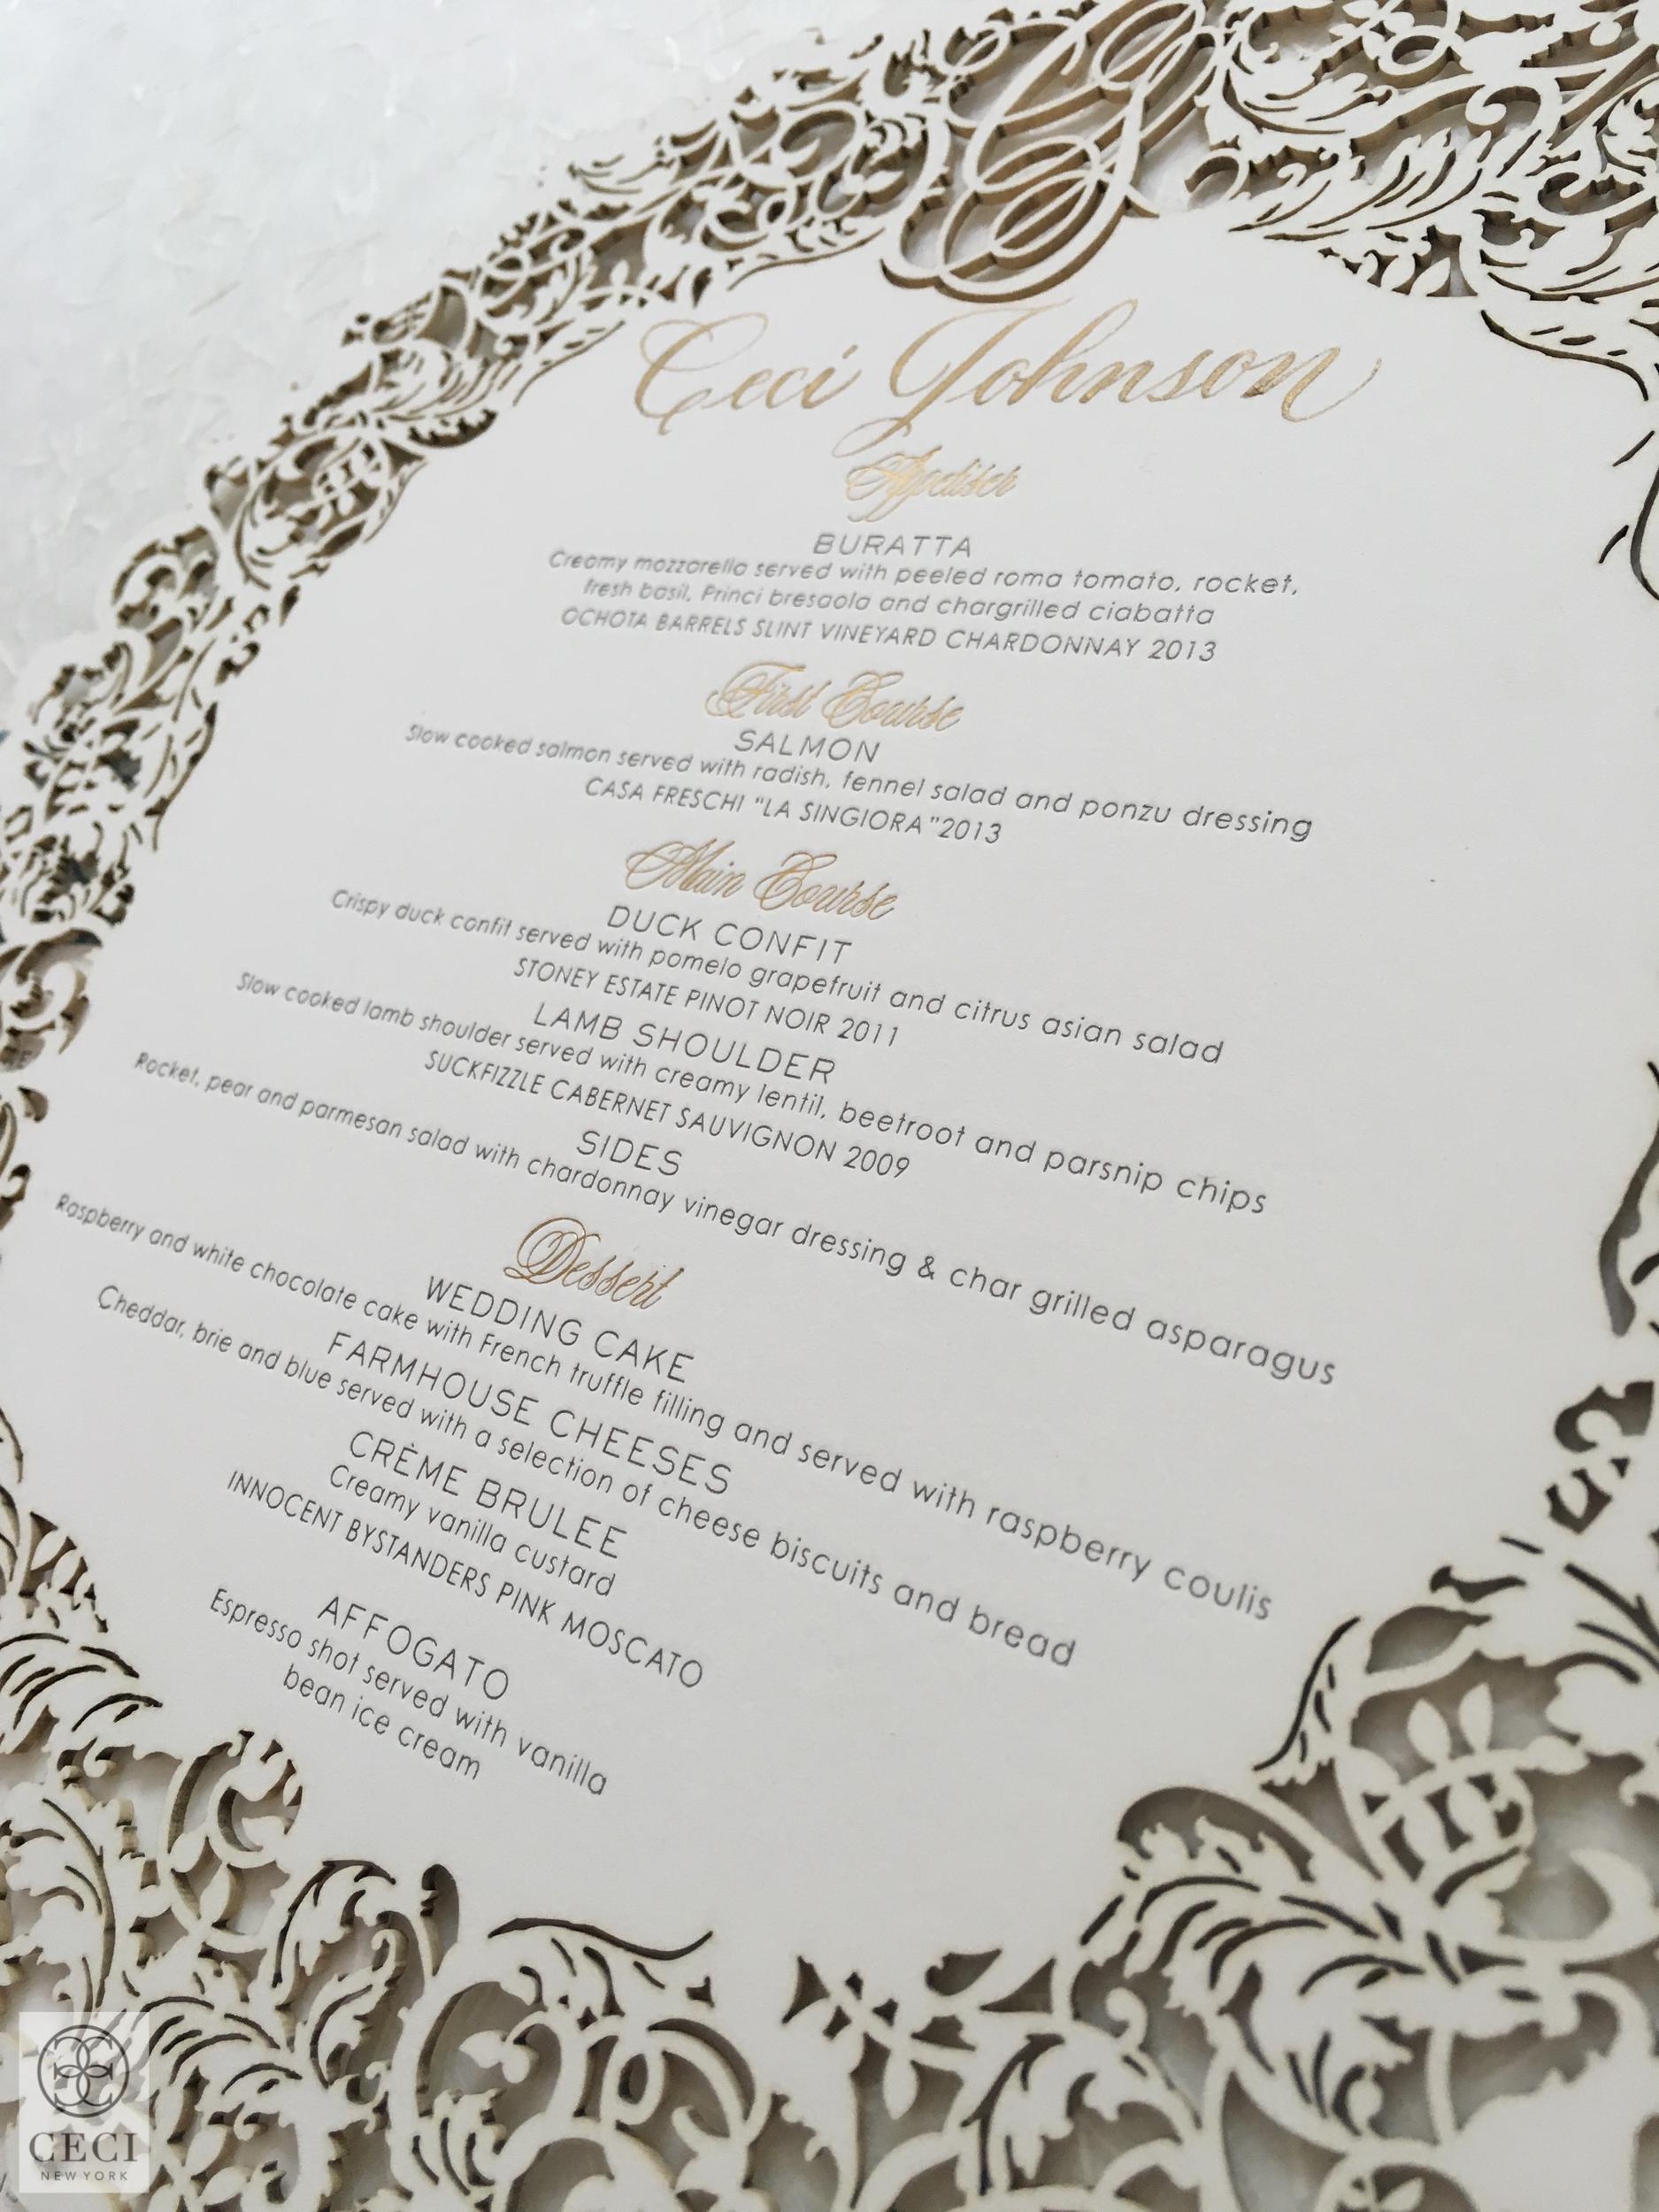 v2Ceci_New_York_Custom_Luxury_Wedding_BeautyShot_LaserCut_Stationery_Personalized_Couture_Foil_Stamping_Perth_Destination_Australia_Chic_-5.jpg